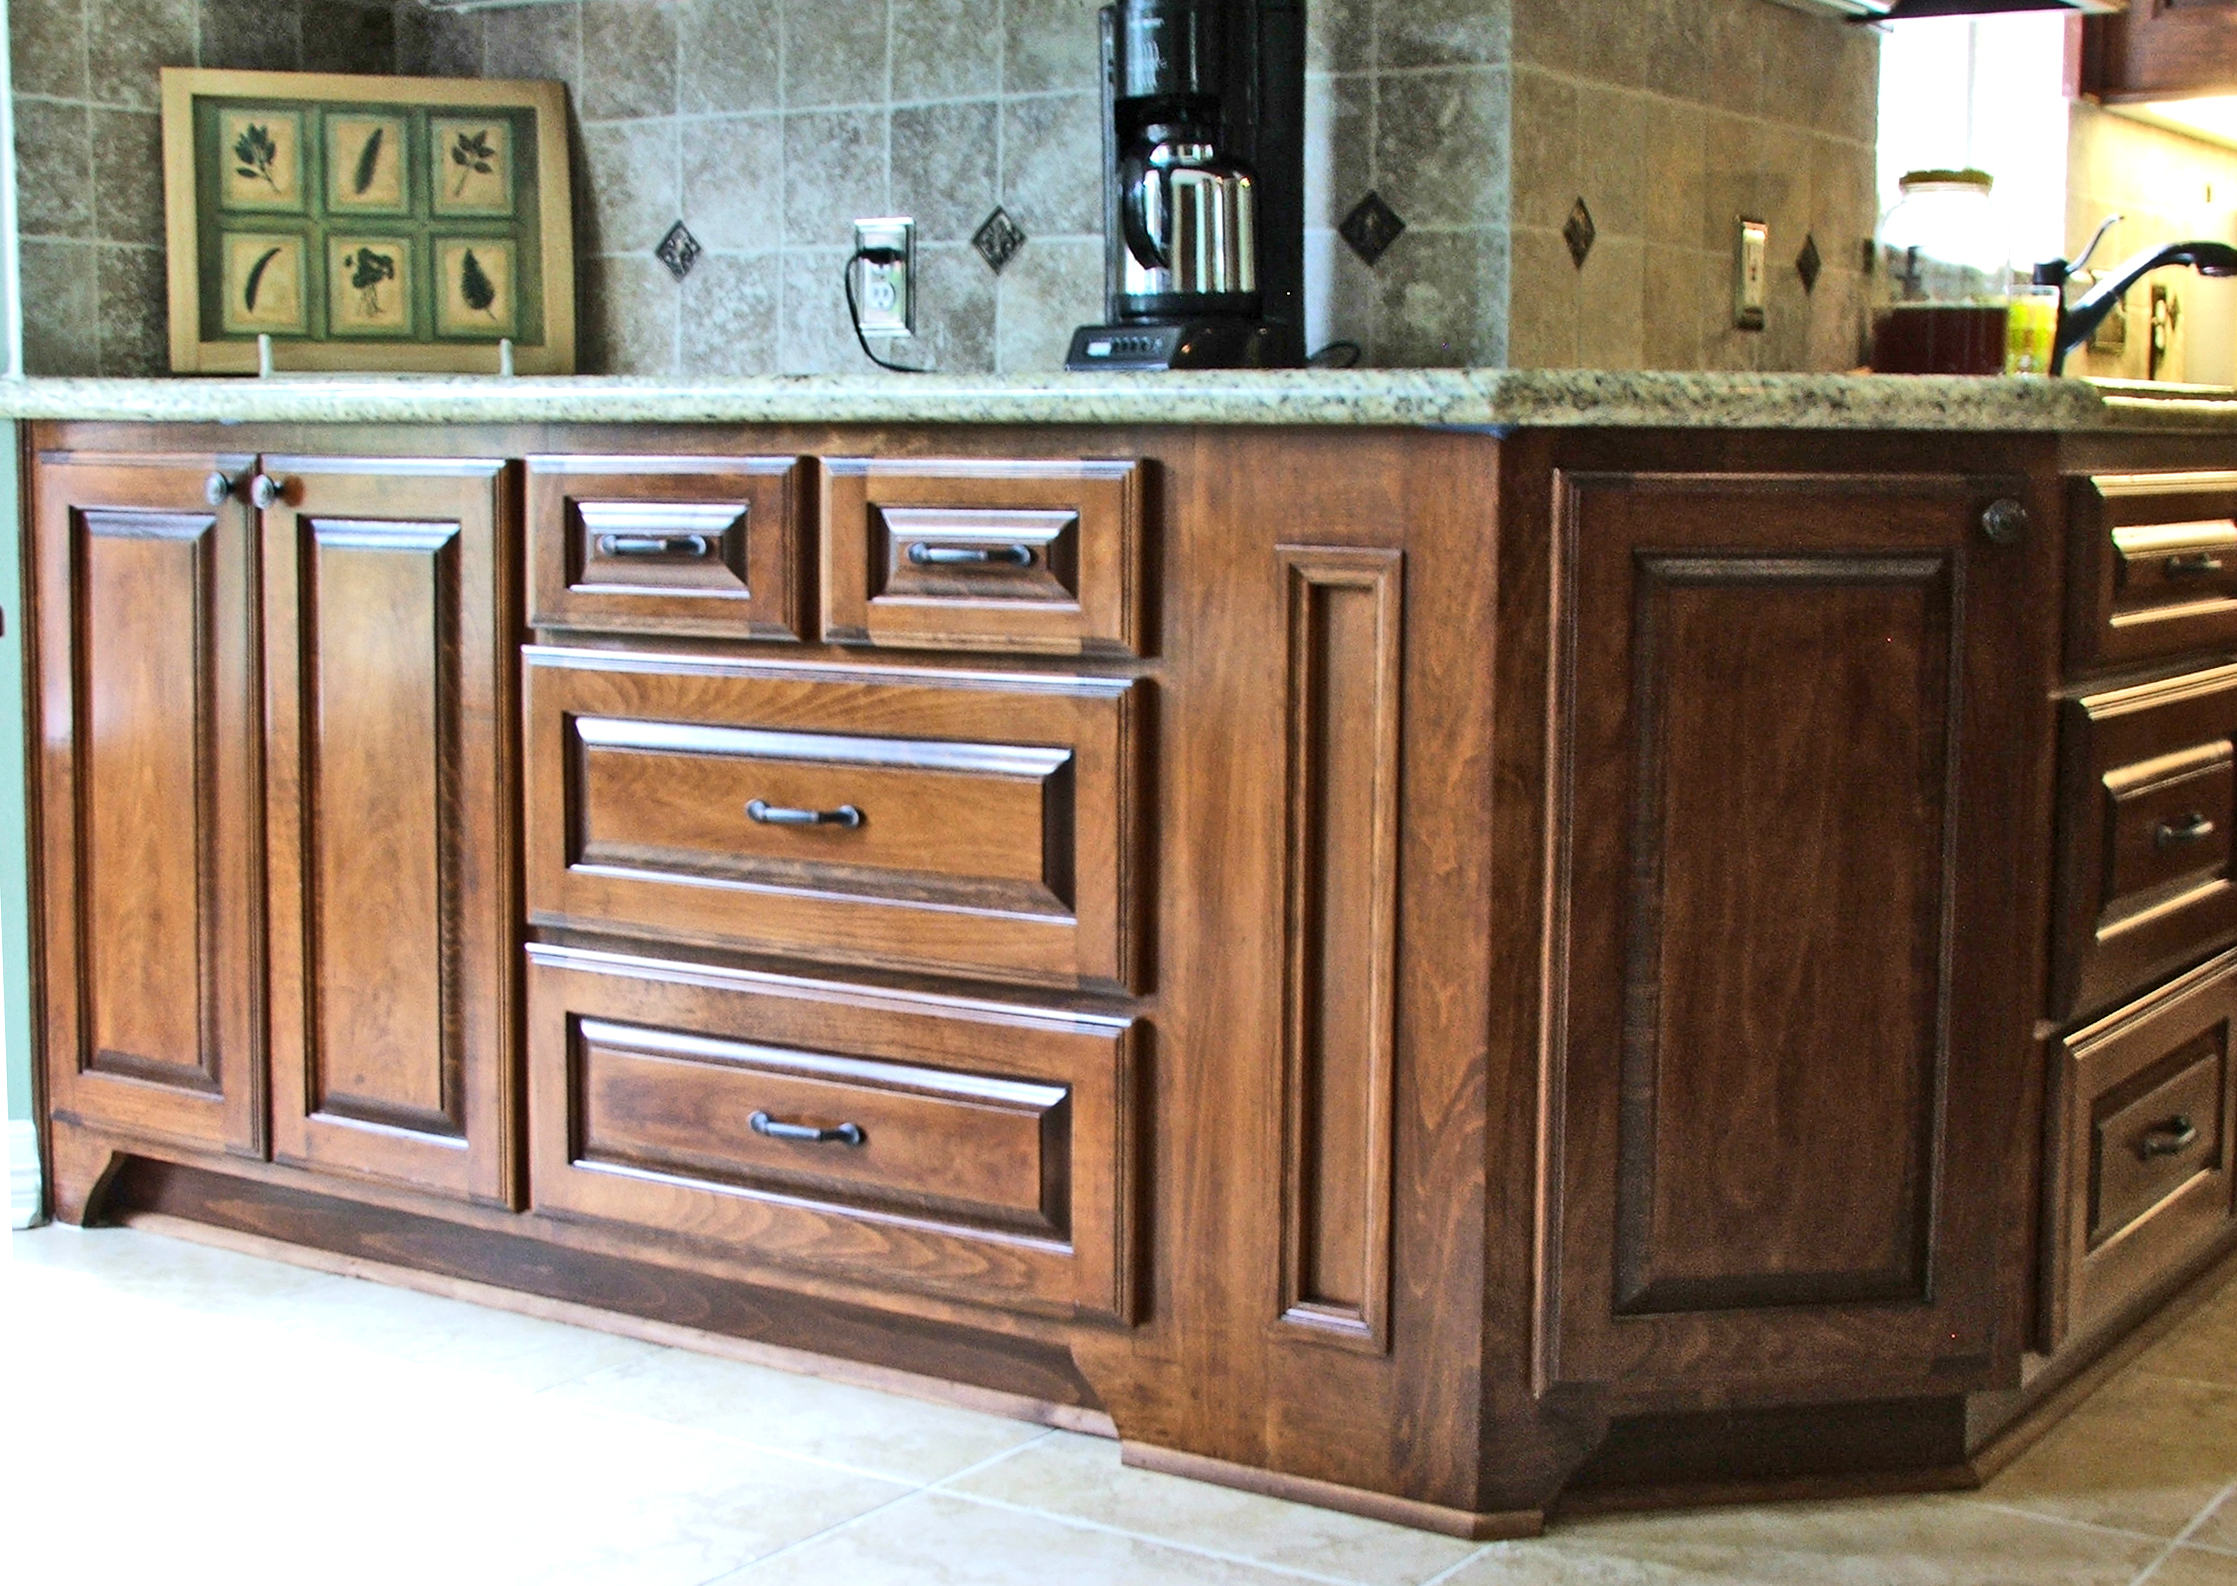 Beech kitchen cabinets 055 | RVA Choice Kitchen & Bath